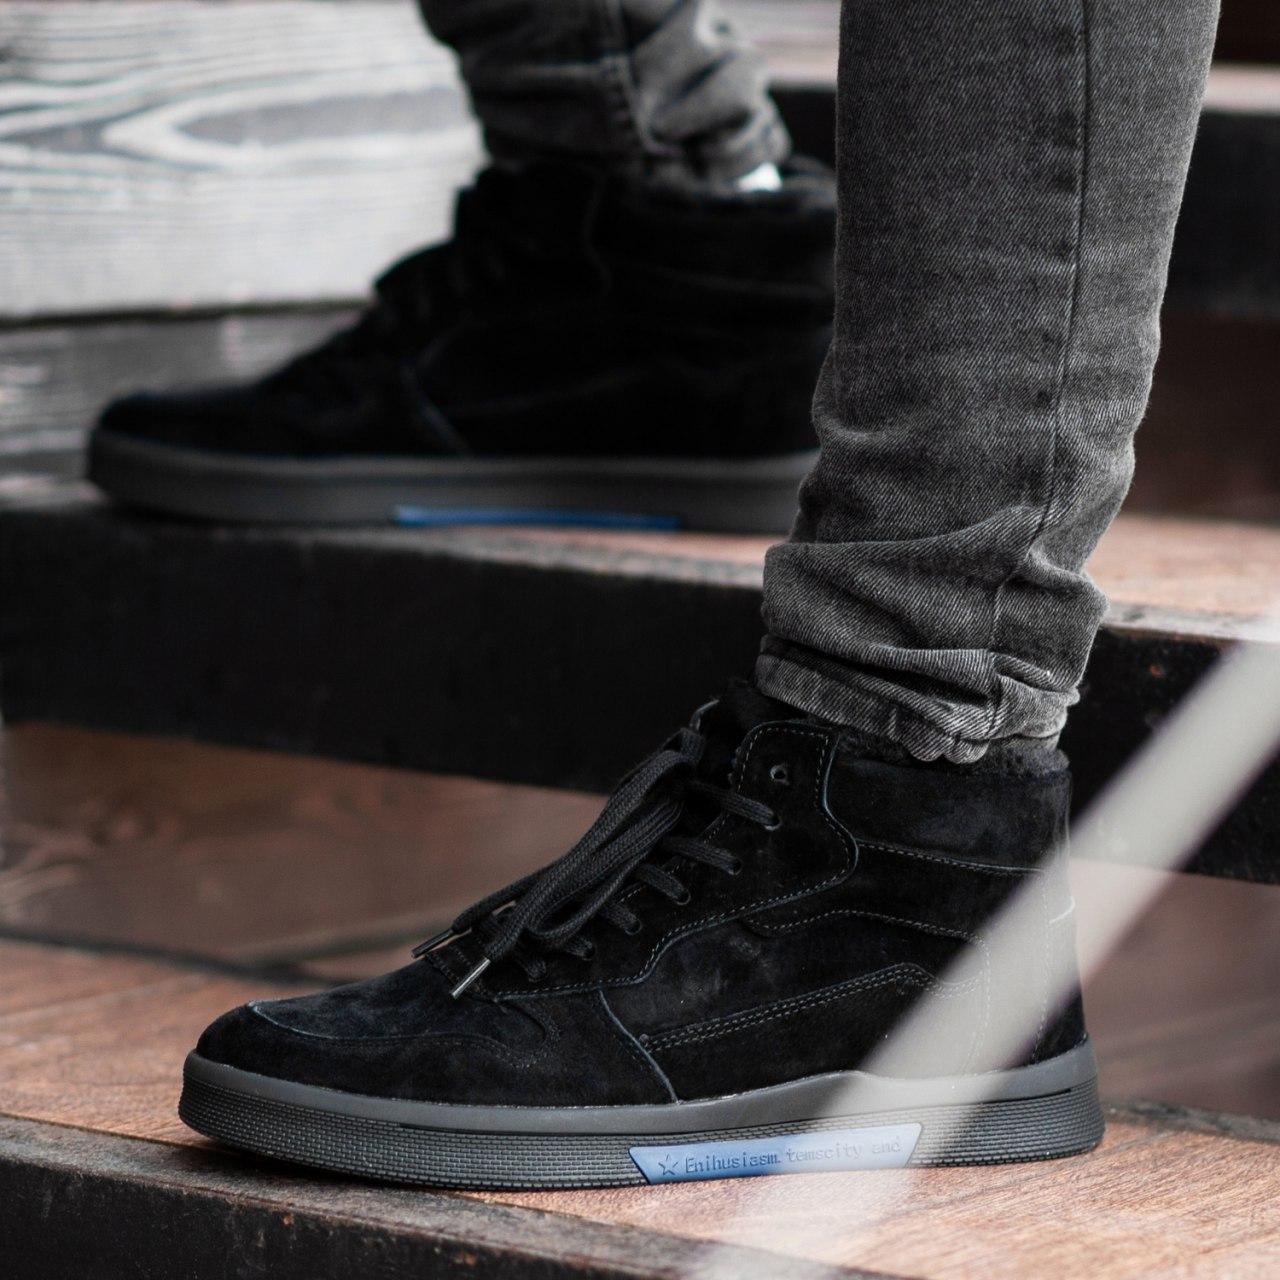 Ботинки South Oriole black - фото 3